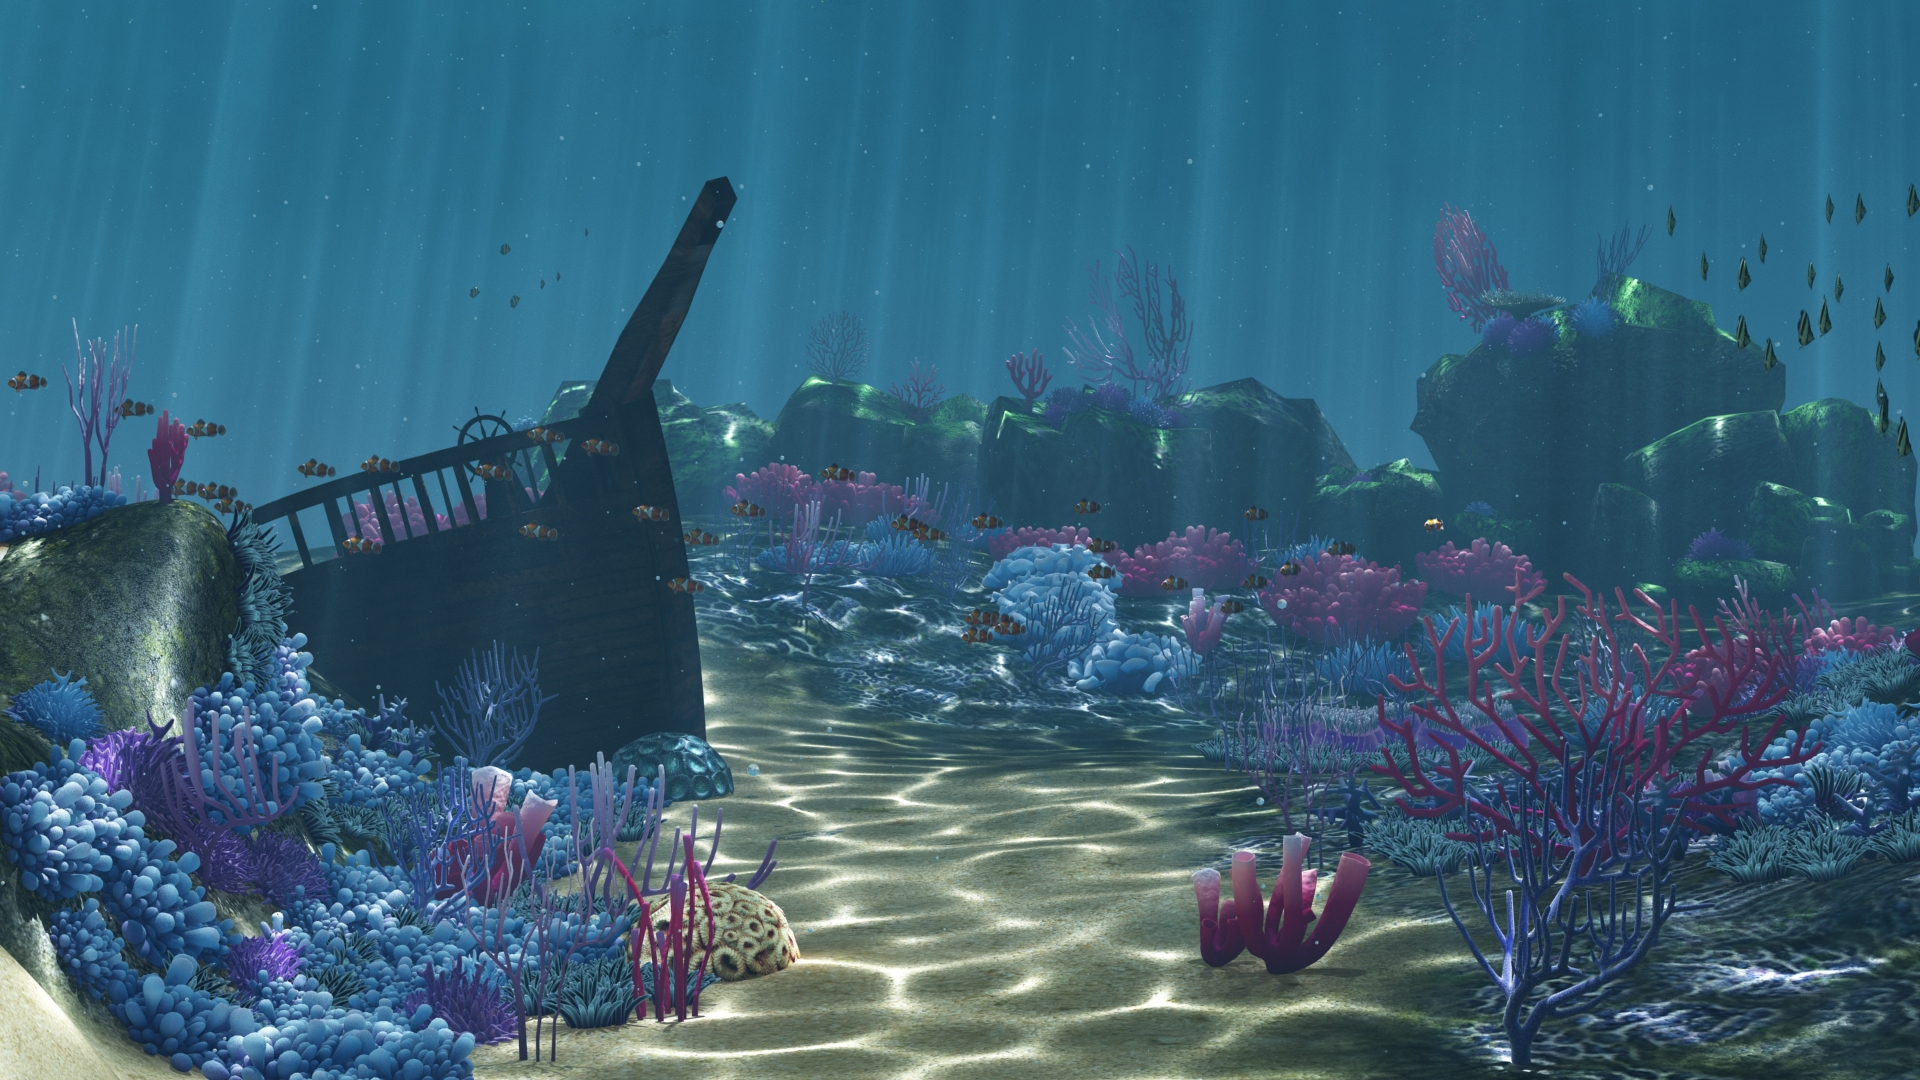 Ocean Floor Coral Reefs Cartoon Underwater By Djeymax